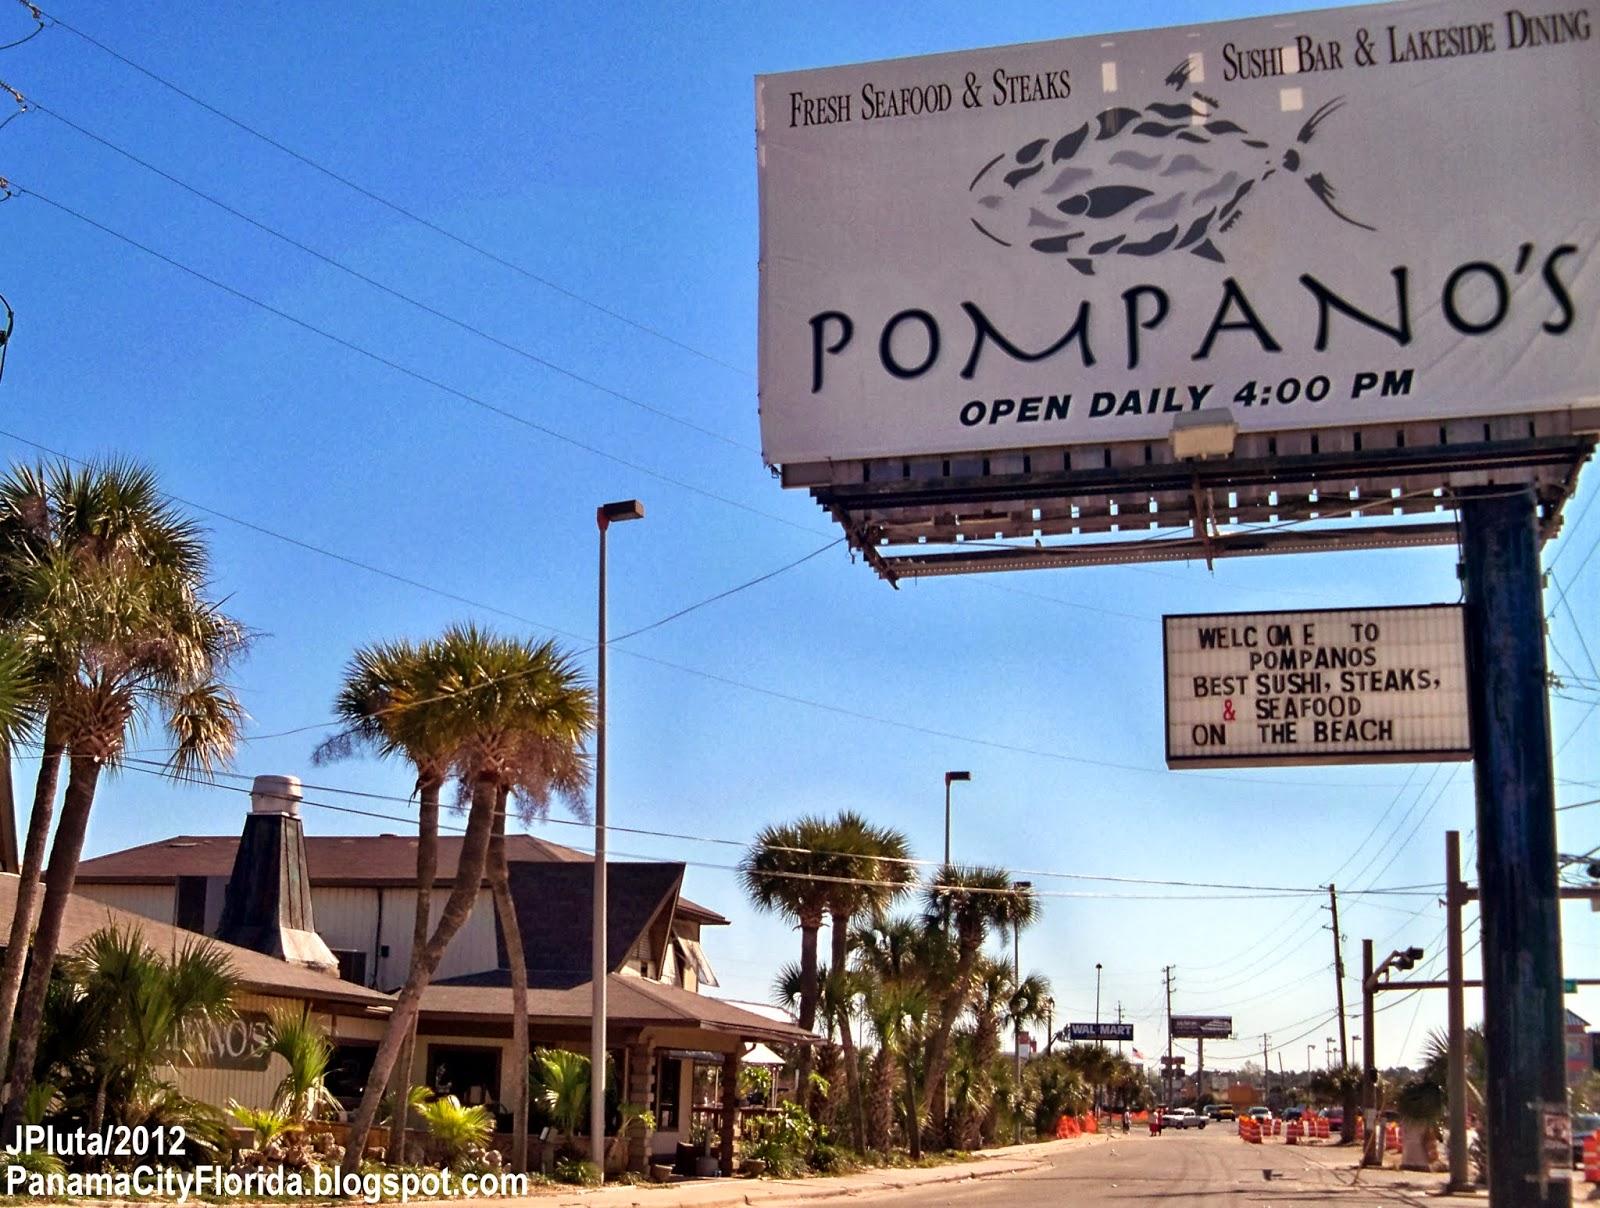 Pompano S Restaurant Panama City Beach Florida Front Road Seafood Steaks Sushi Dining Fl Bar